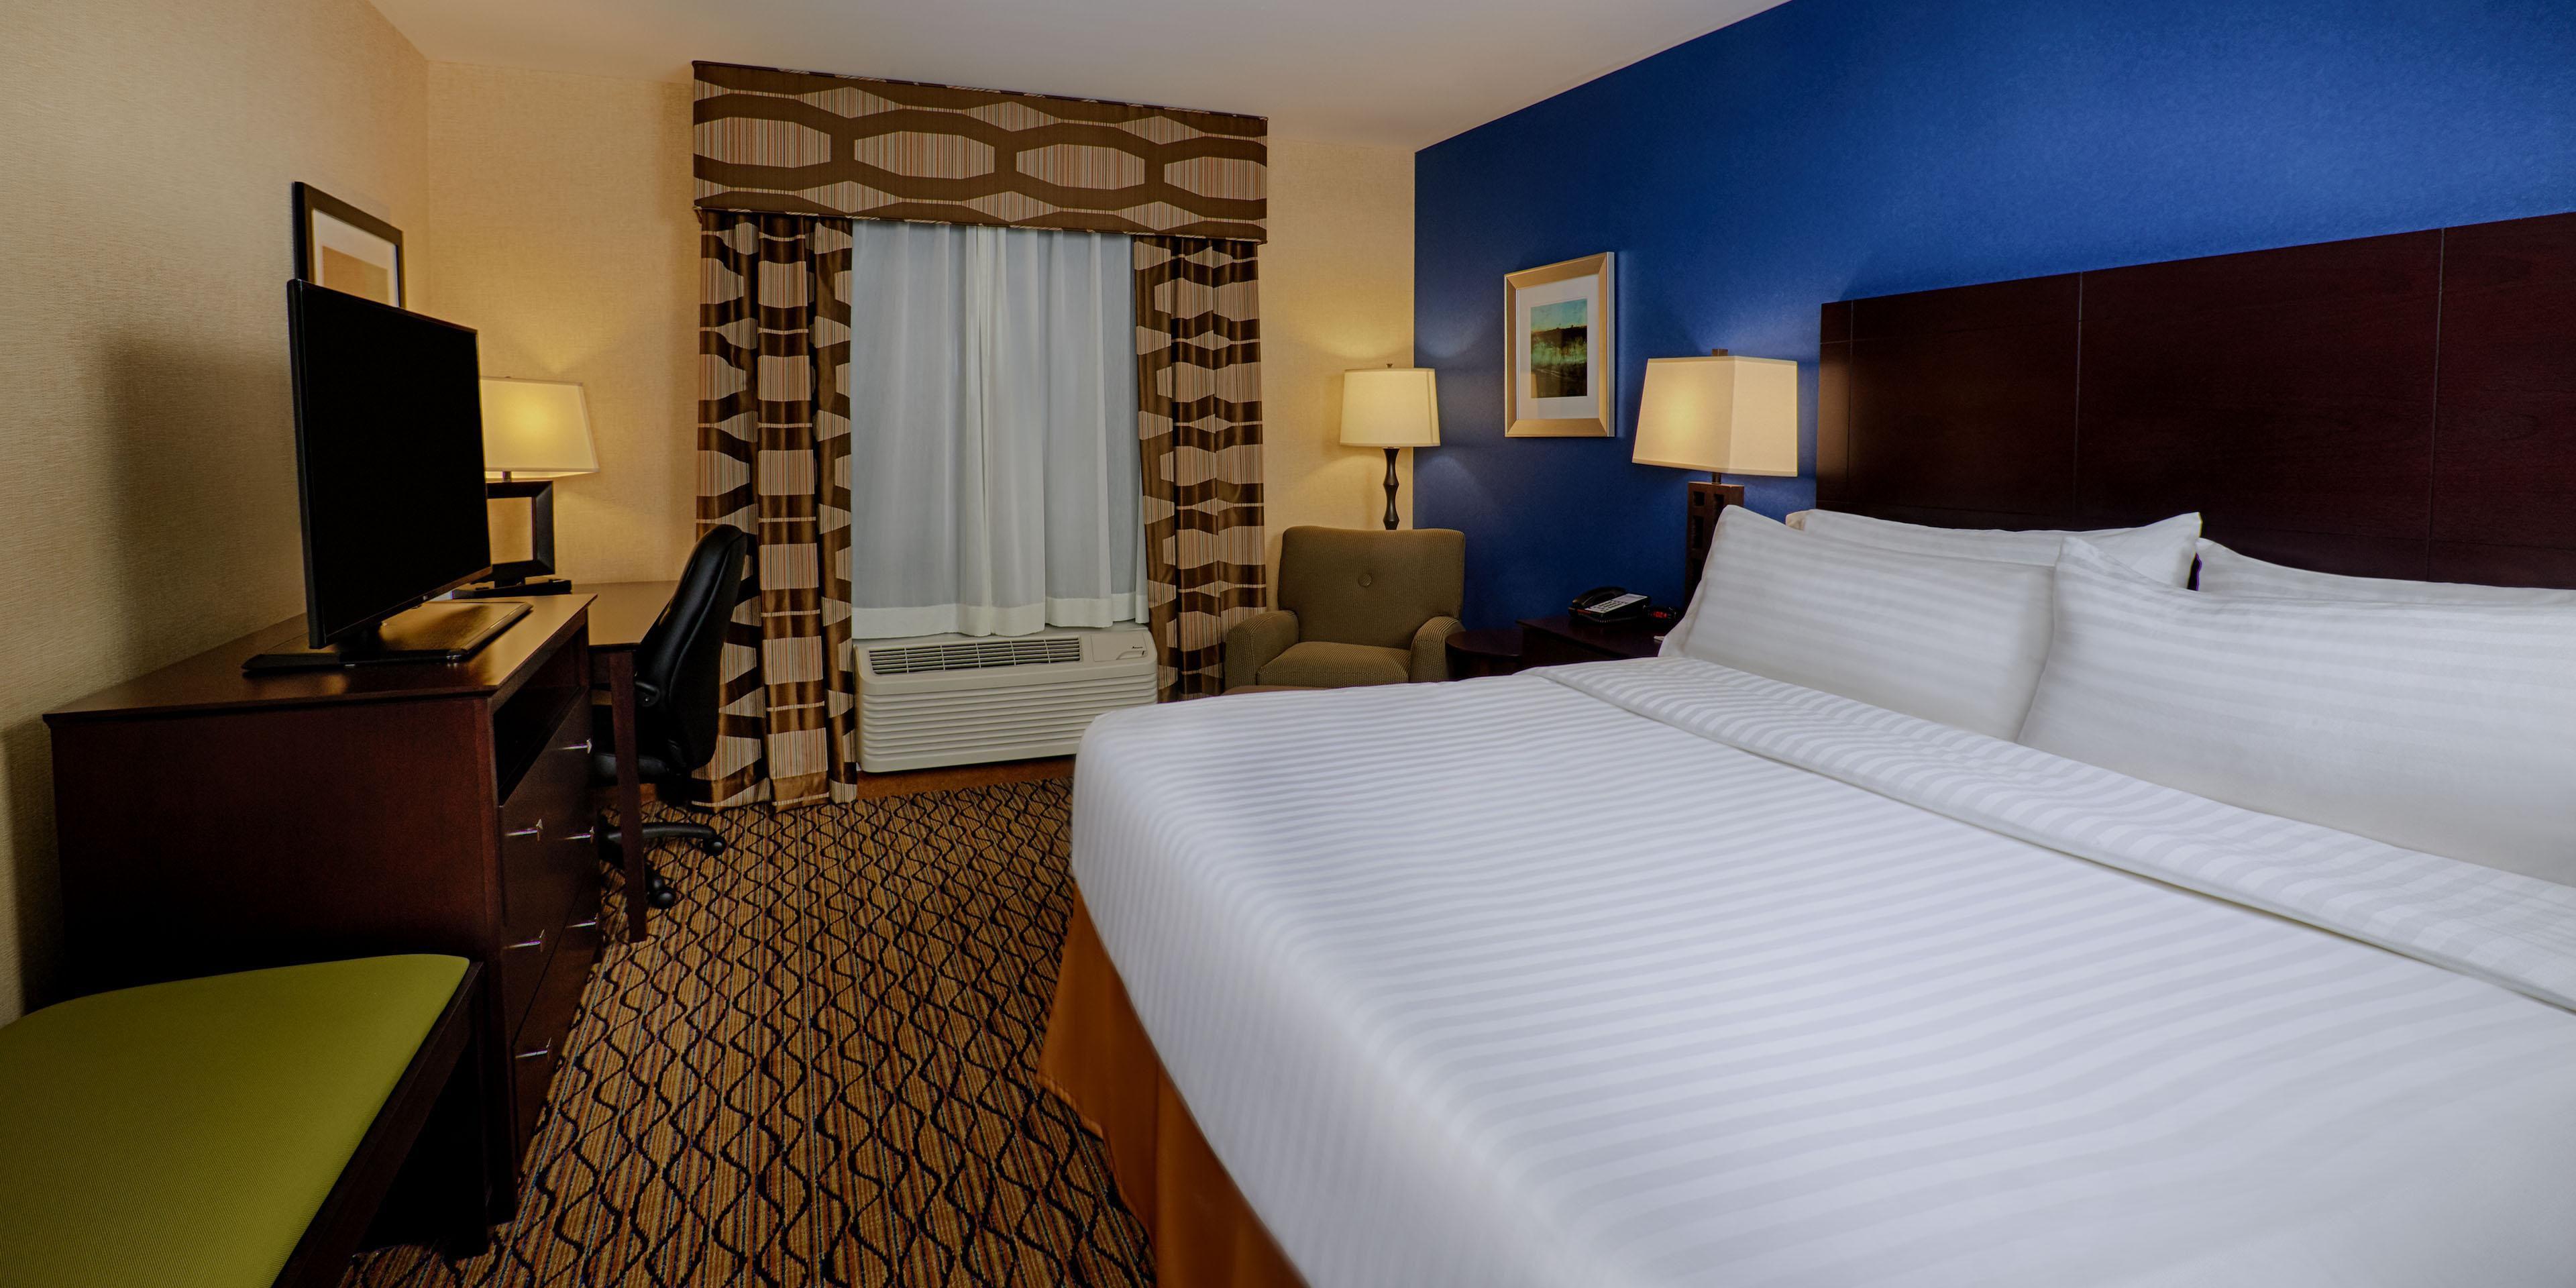 Holiday Inn Express Bordentown 5014682767 2x1